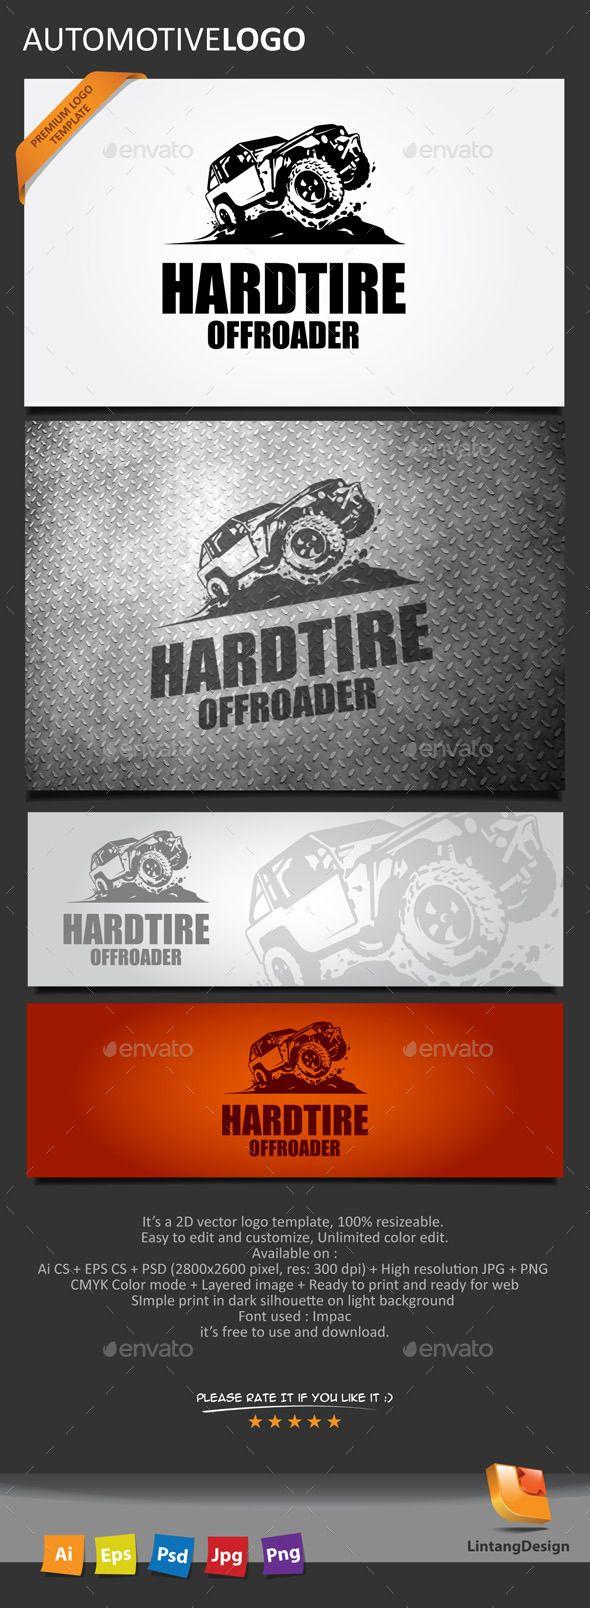 Automotive Logo — Photoshop PSD #community #vector • Available here → https://graphicriver.net/item/automotive-logo/10421857?ref=pxcr